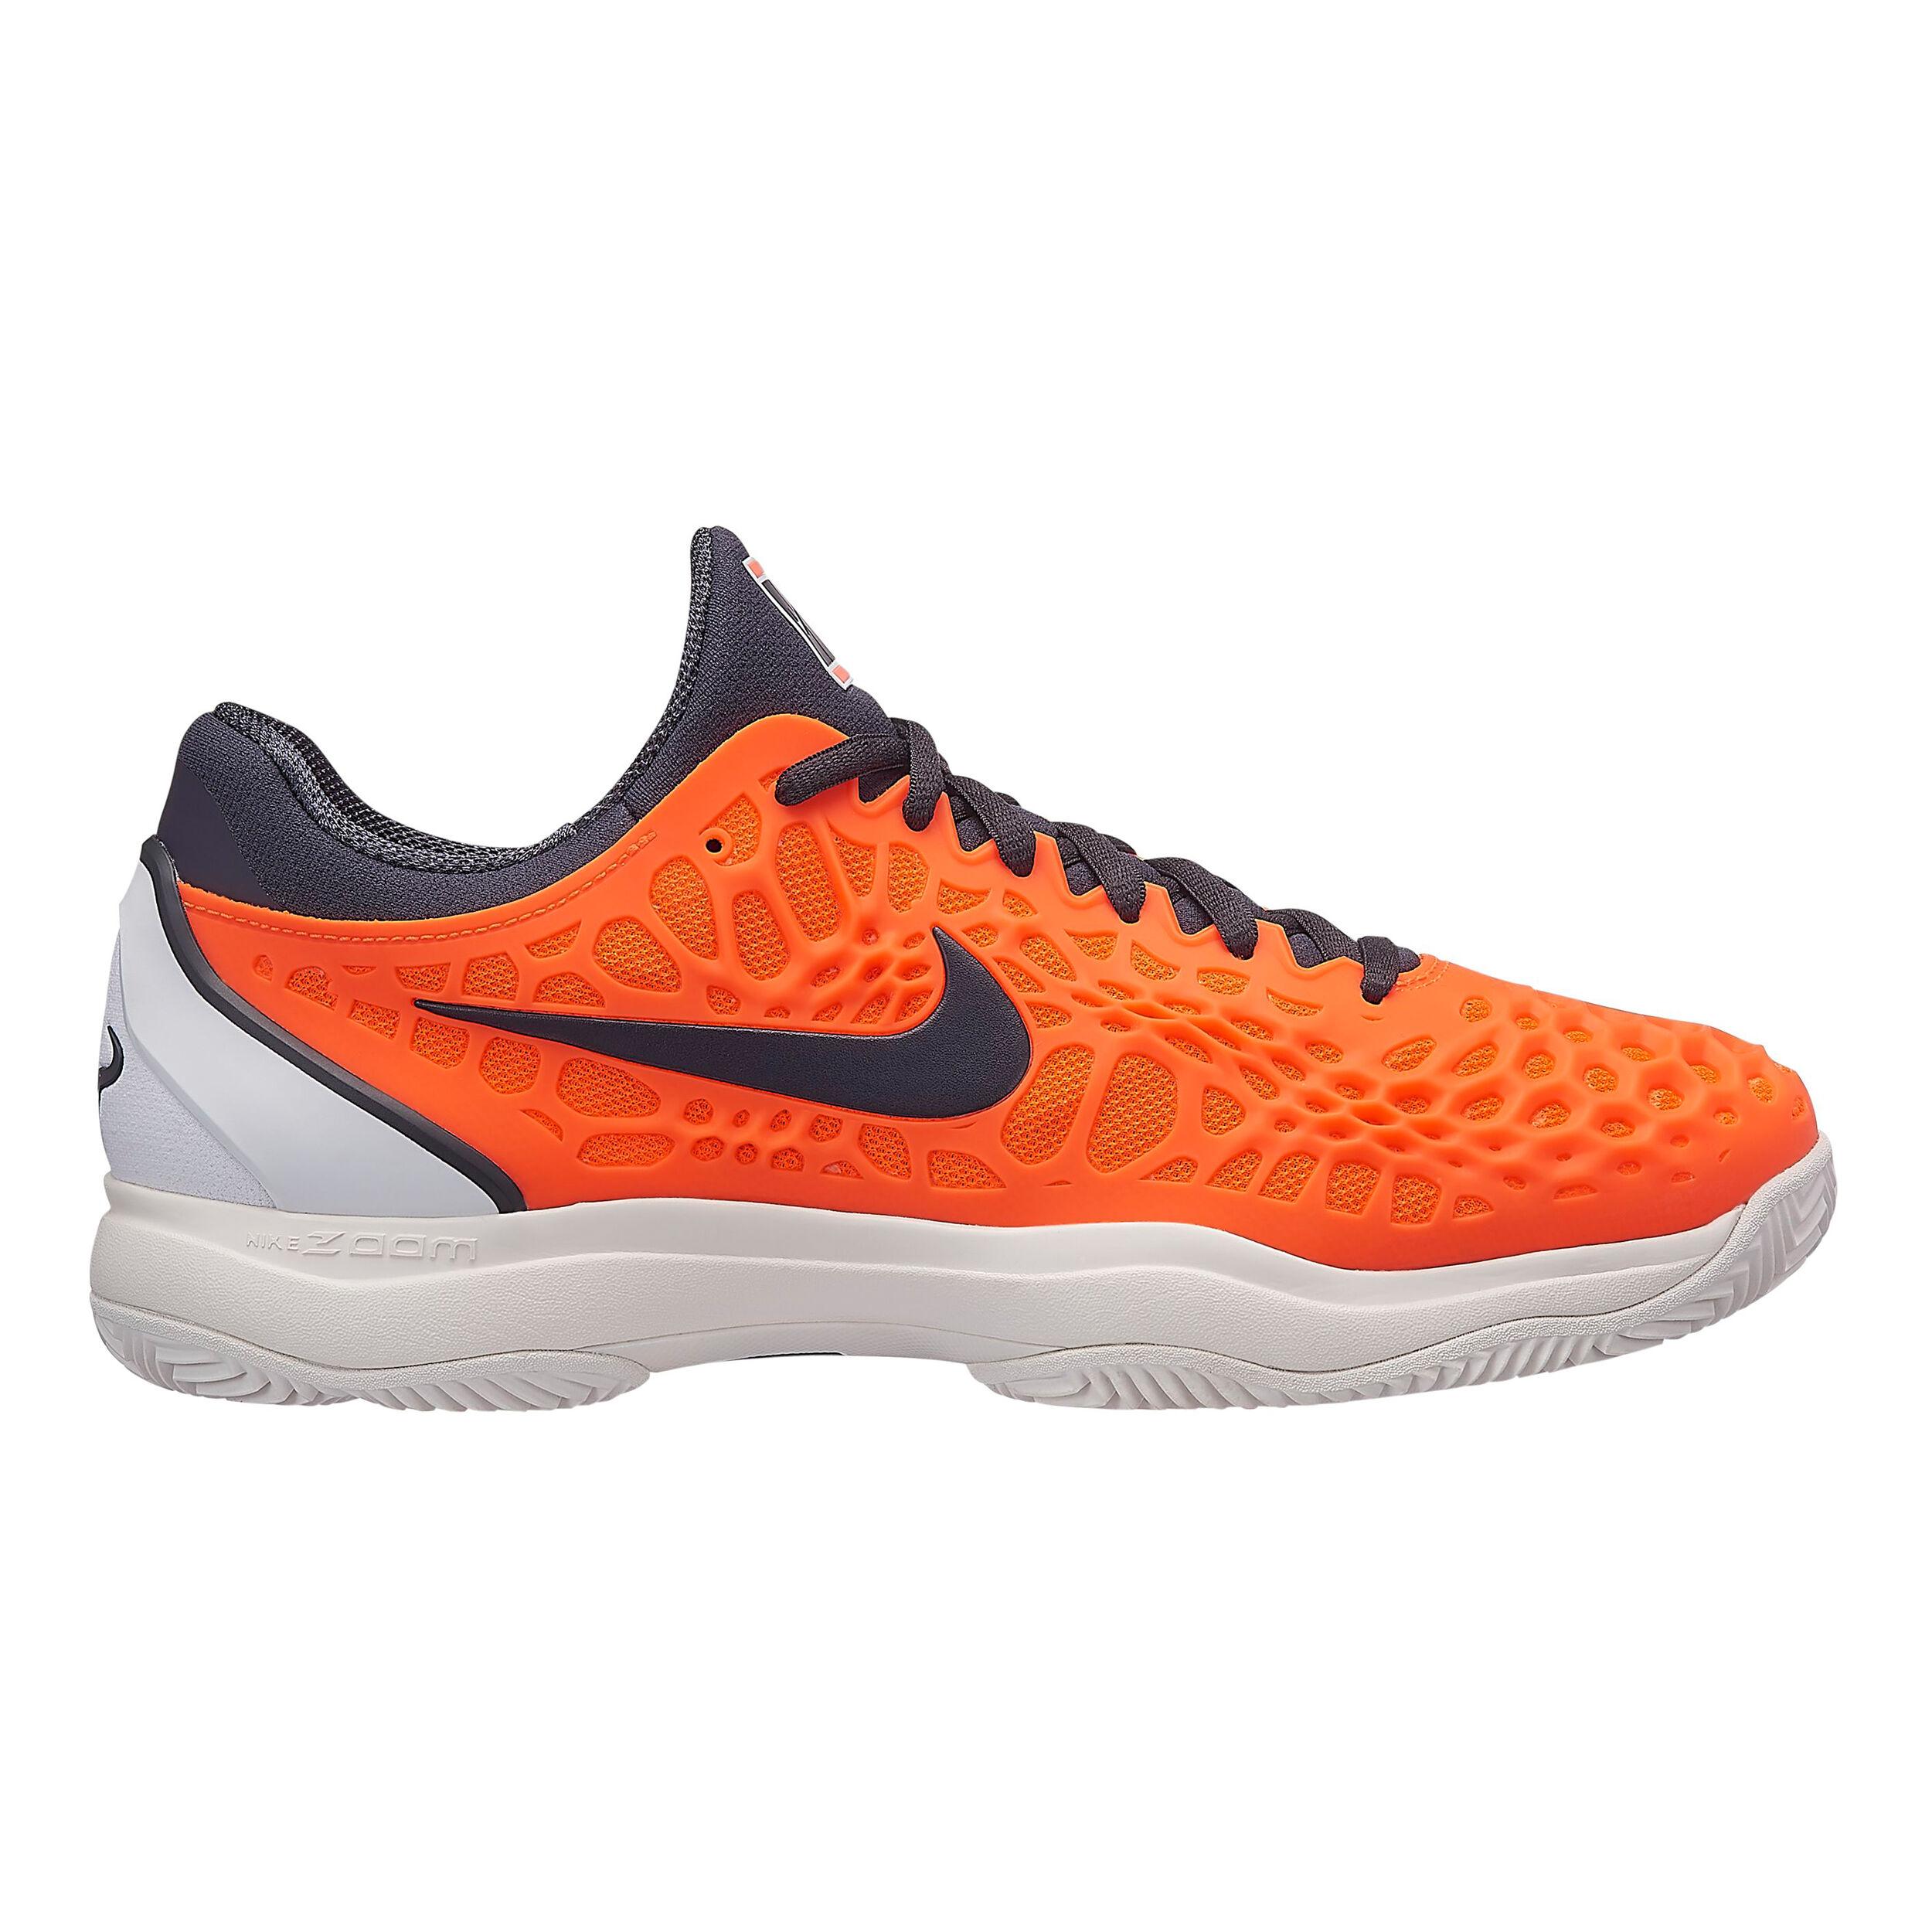 Nike Zoom Cage 3 Clay Chaussure Terre Battue Hommes Orange , Gris Foncé